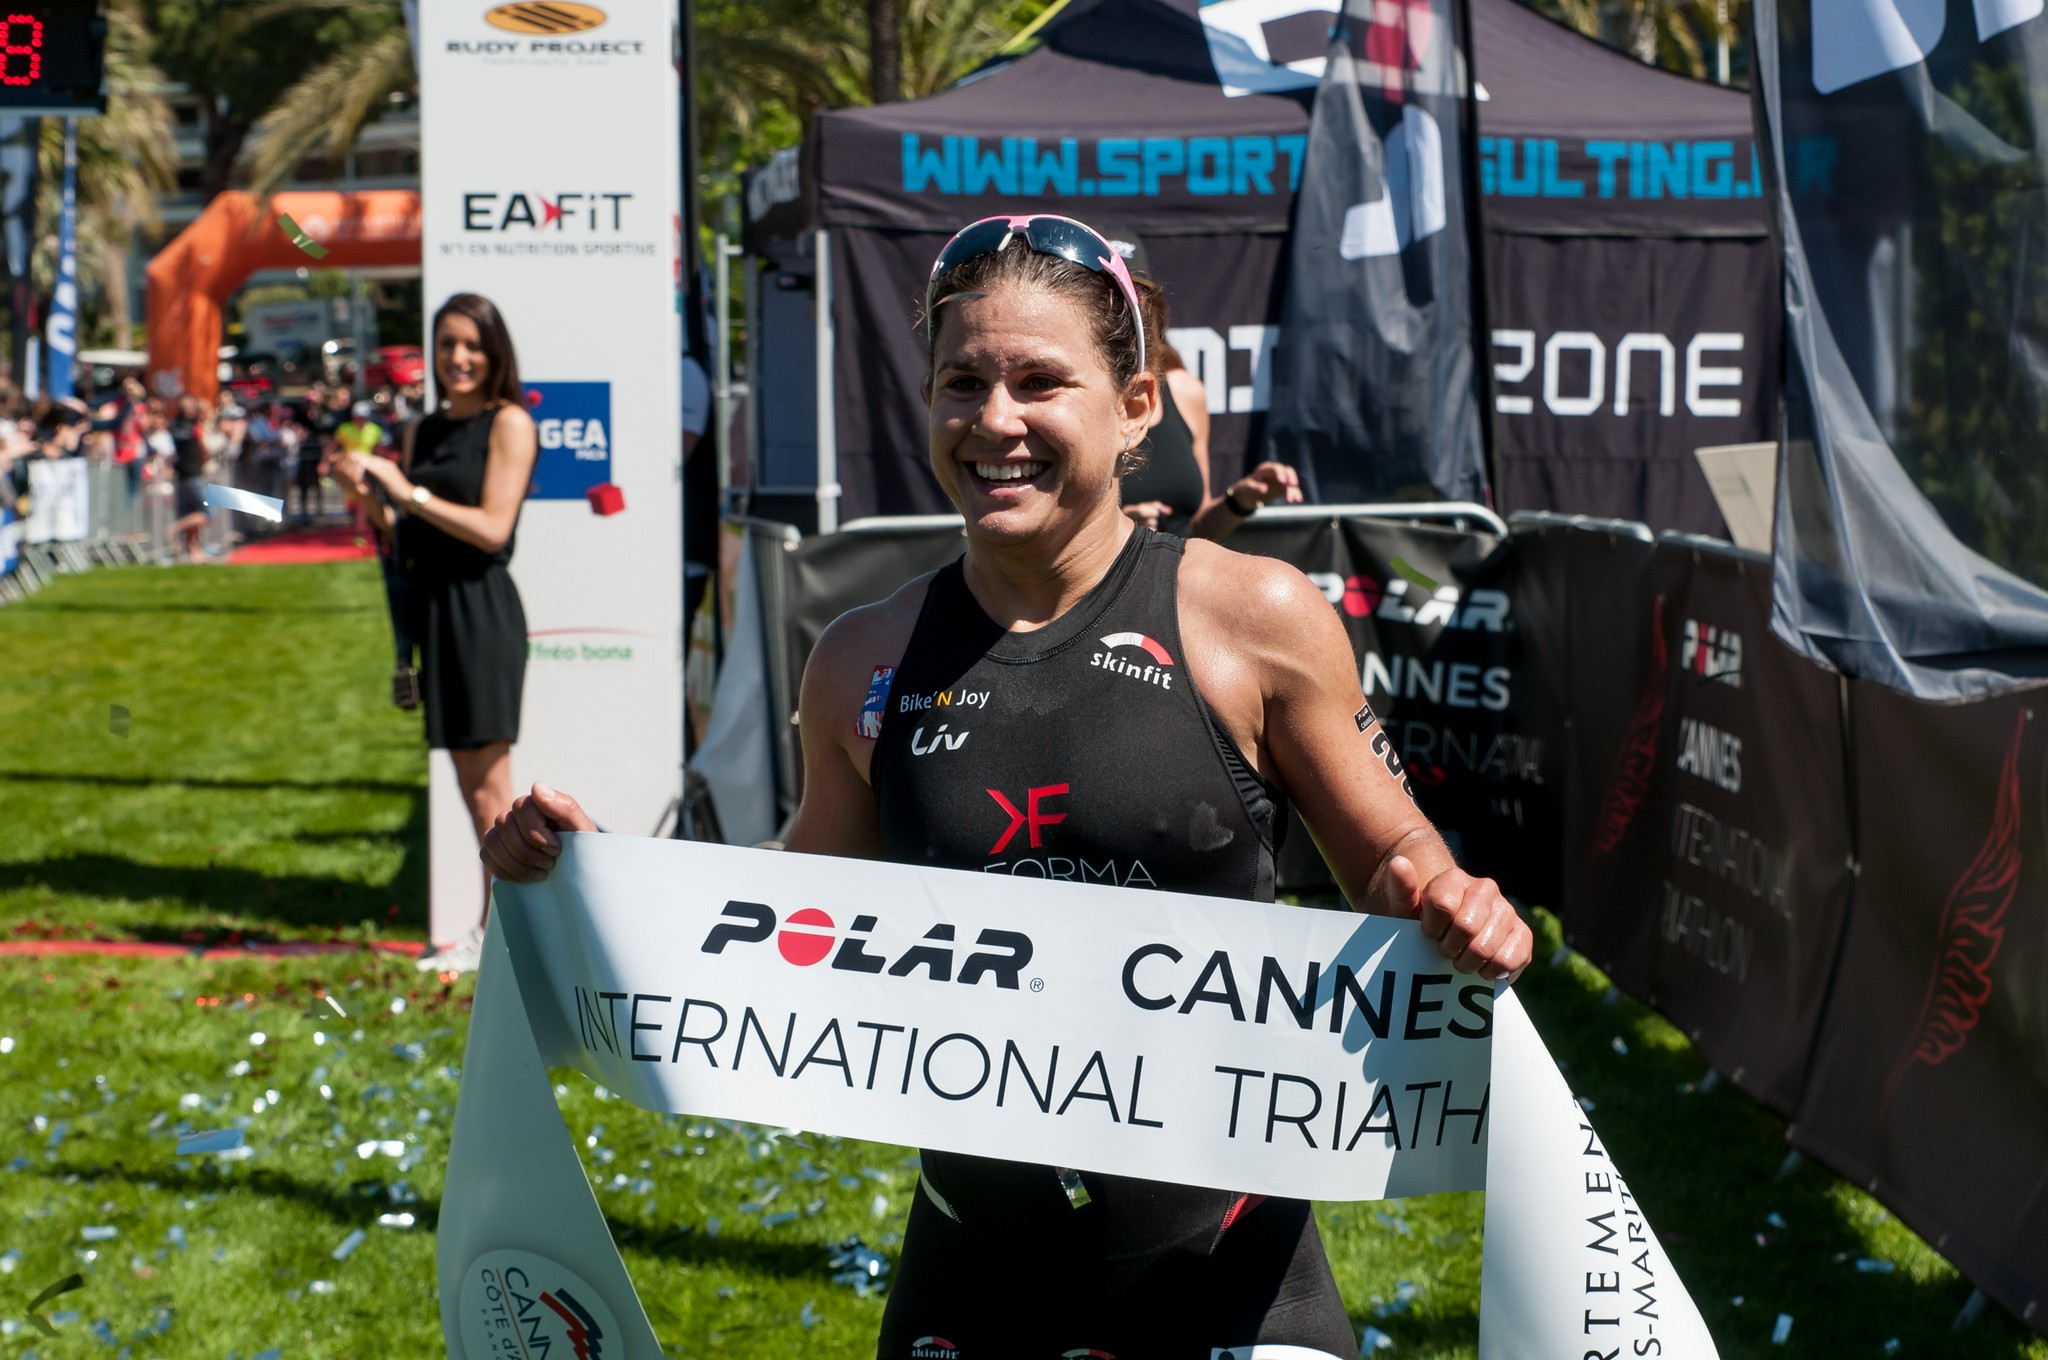 Emma Bilham, winnares in Cannes in 2017 (foto: Mario Vanacker)